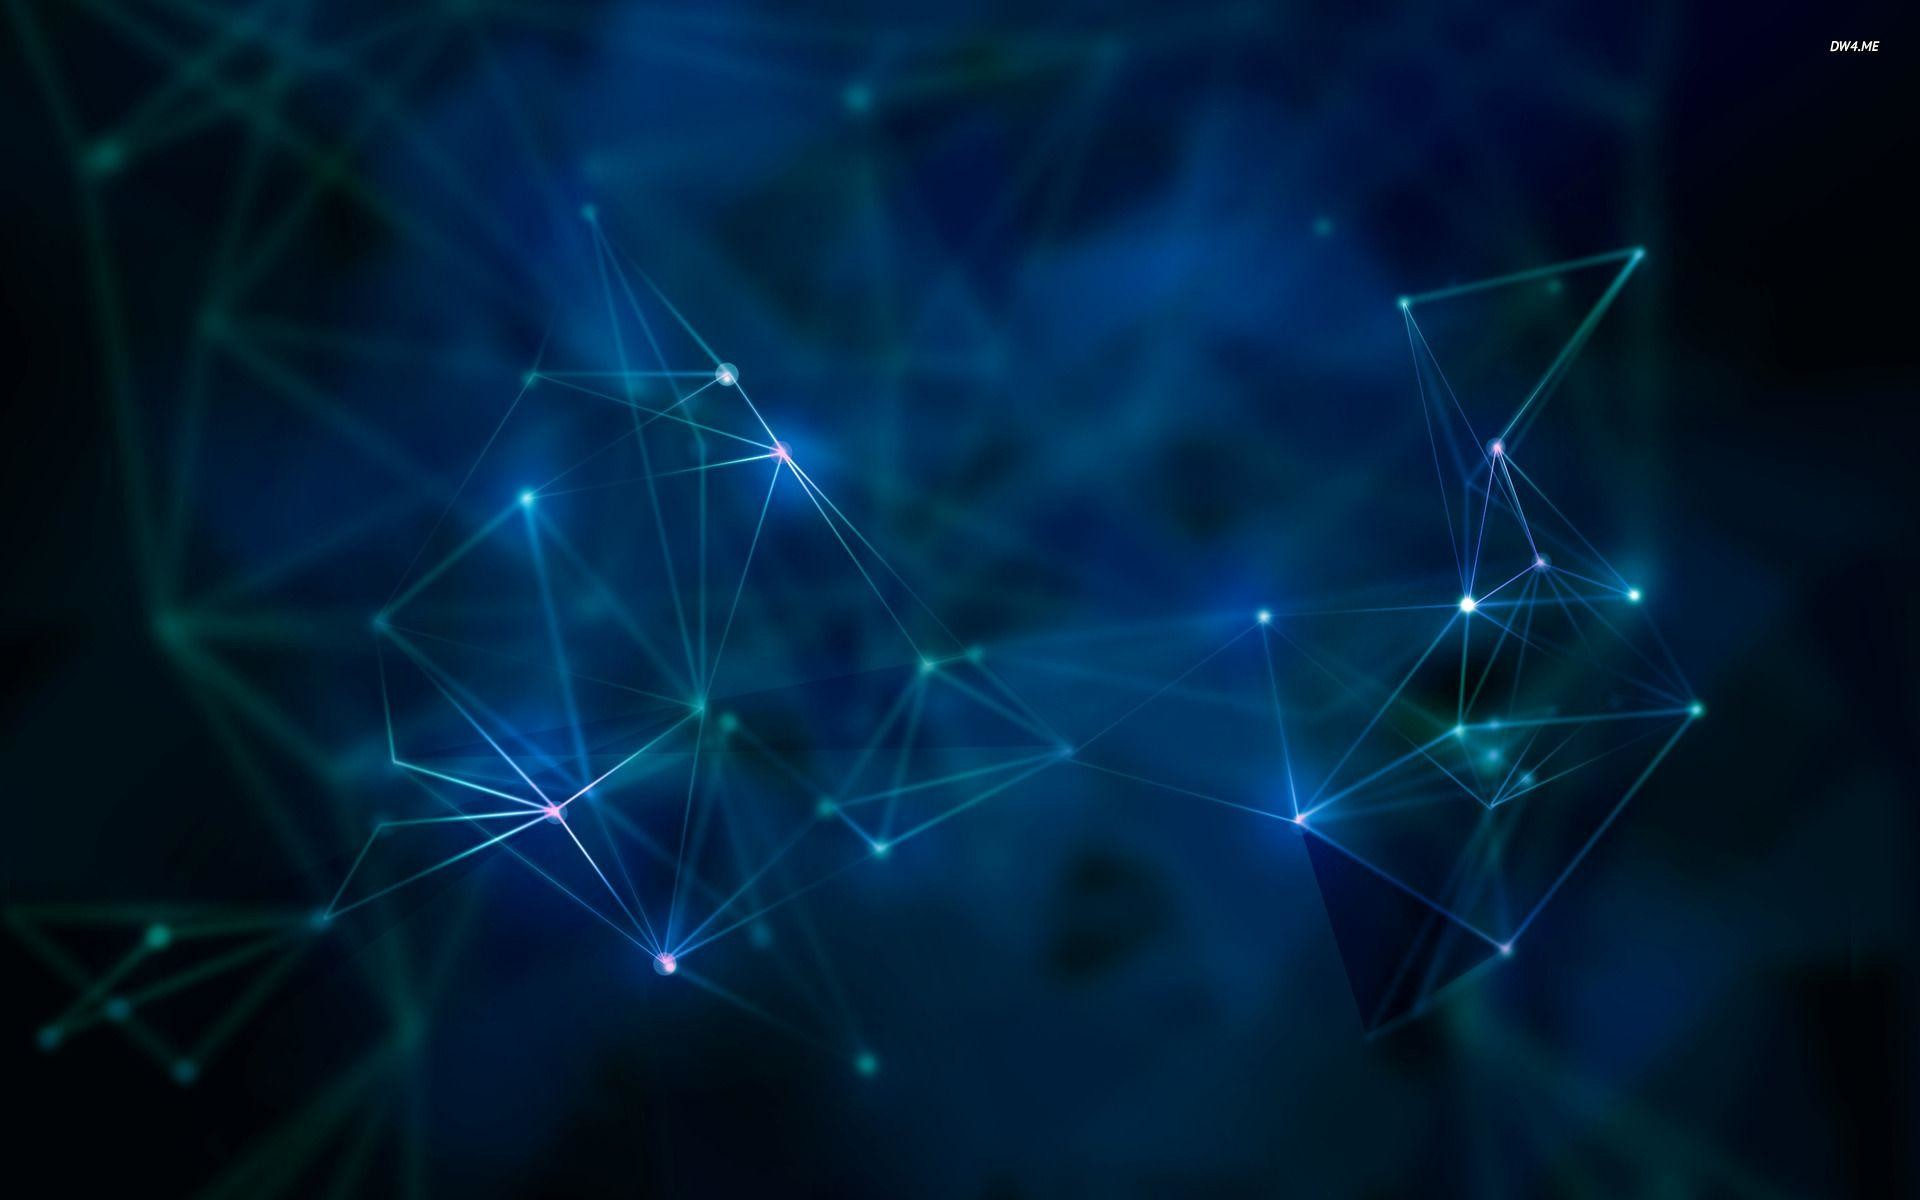 Computer Networking Wallpaper – WallpaperSafari